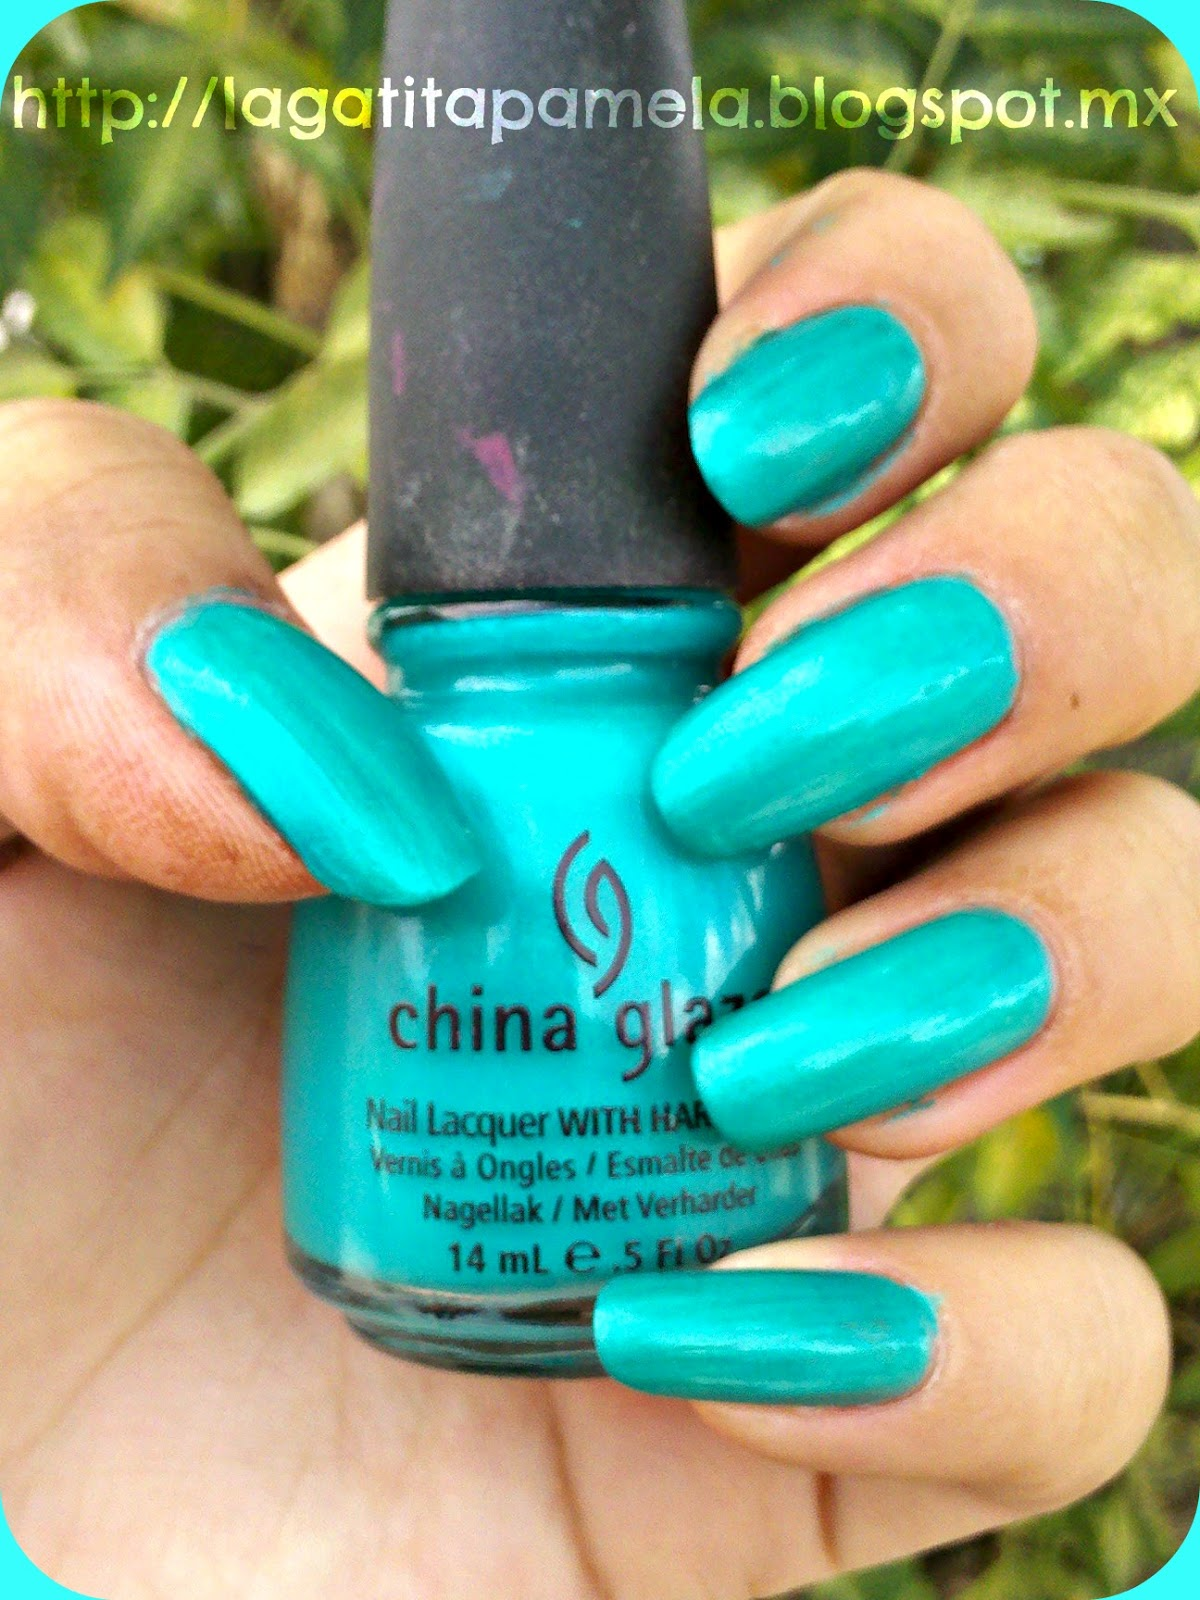 Pamelas Nails China Glaze Turned Up Turquoise Summer Color - Cual-es-el-color-turquesa